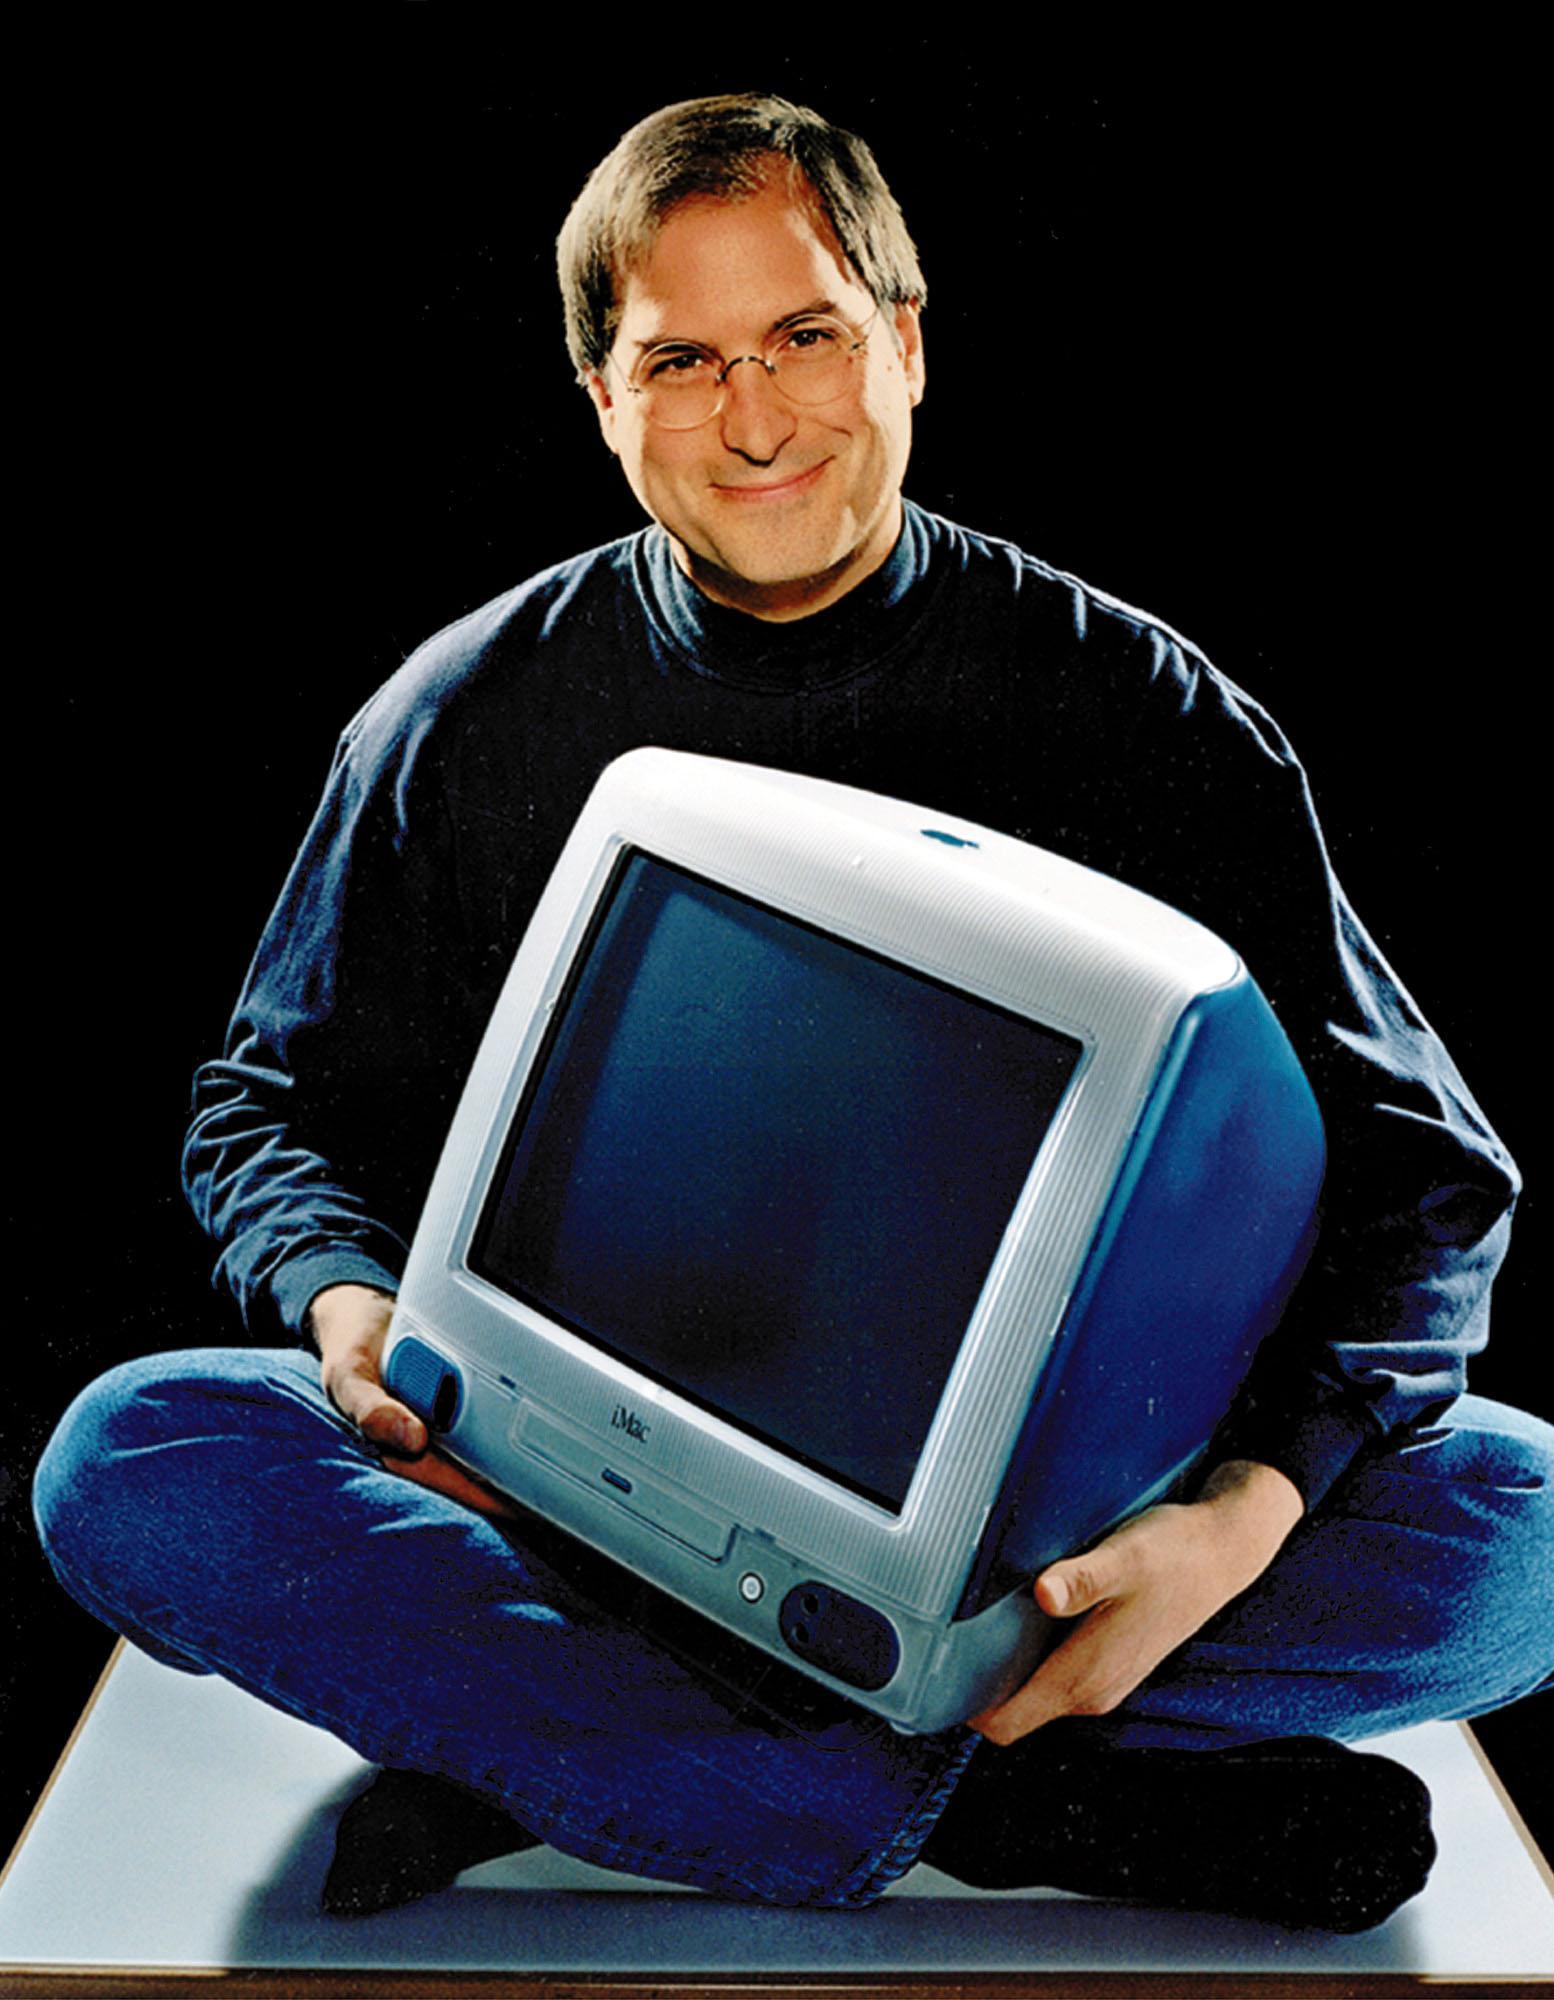 Steve Jobs and iMac